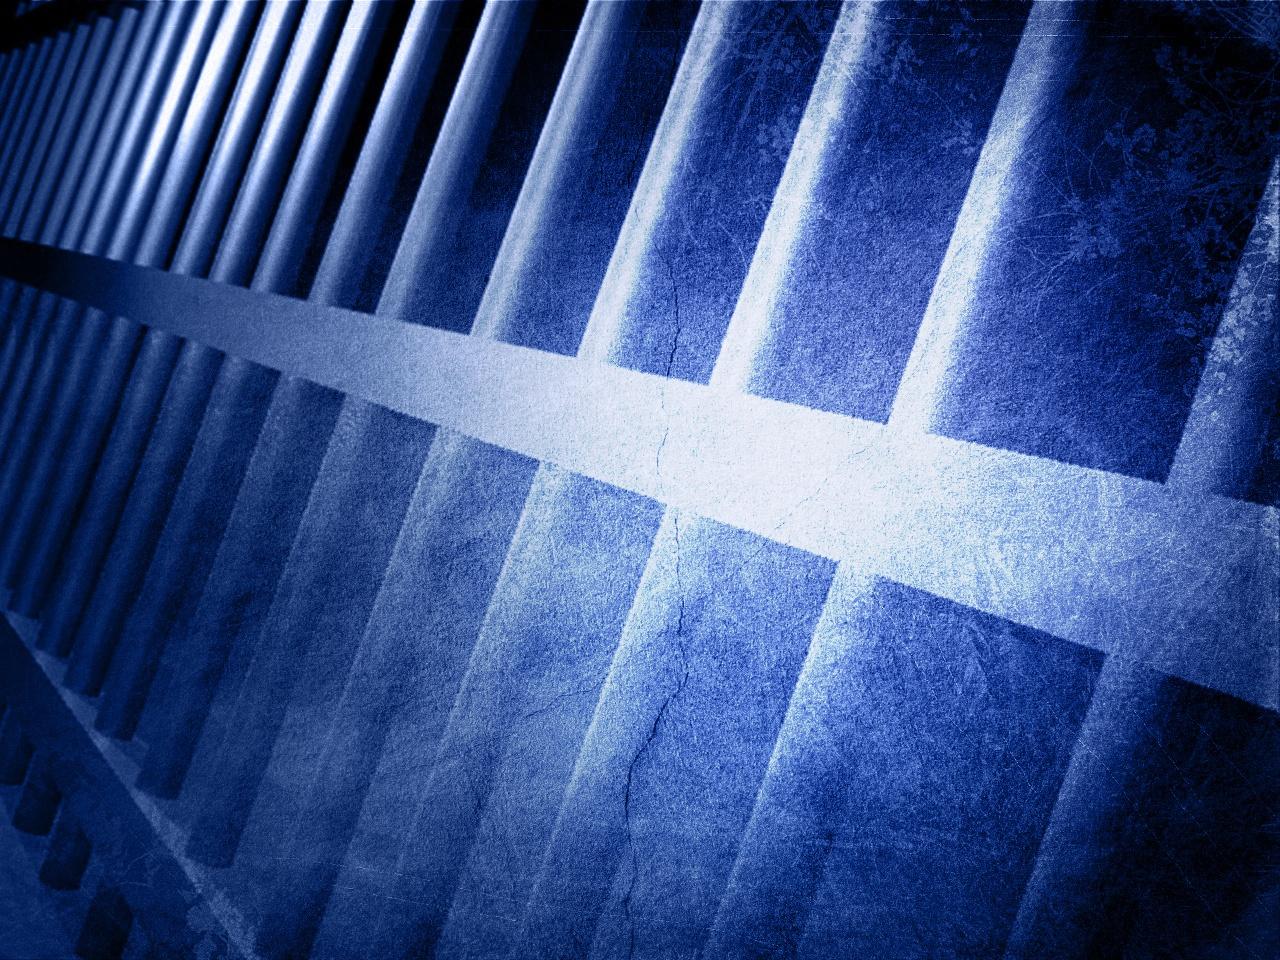 jail_prison_1535673854848.jpg